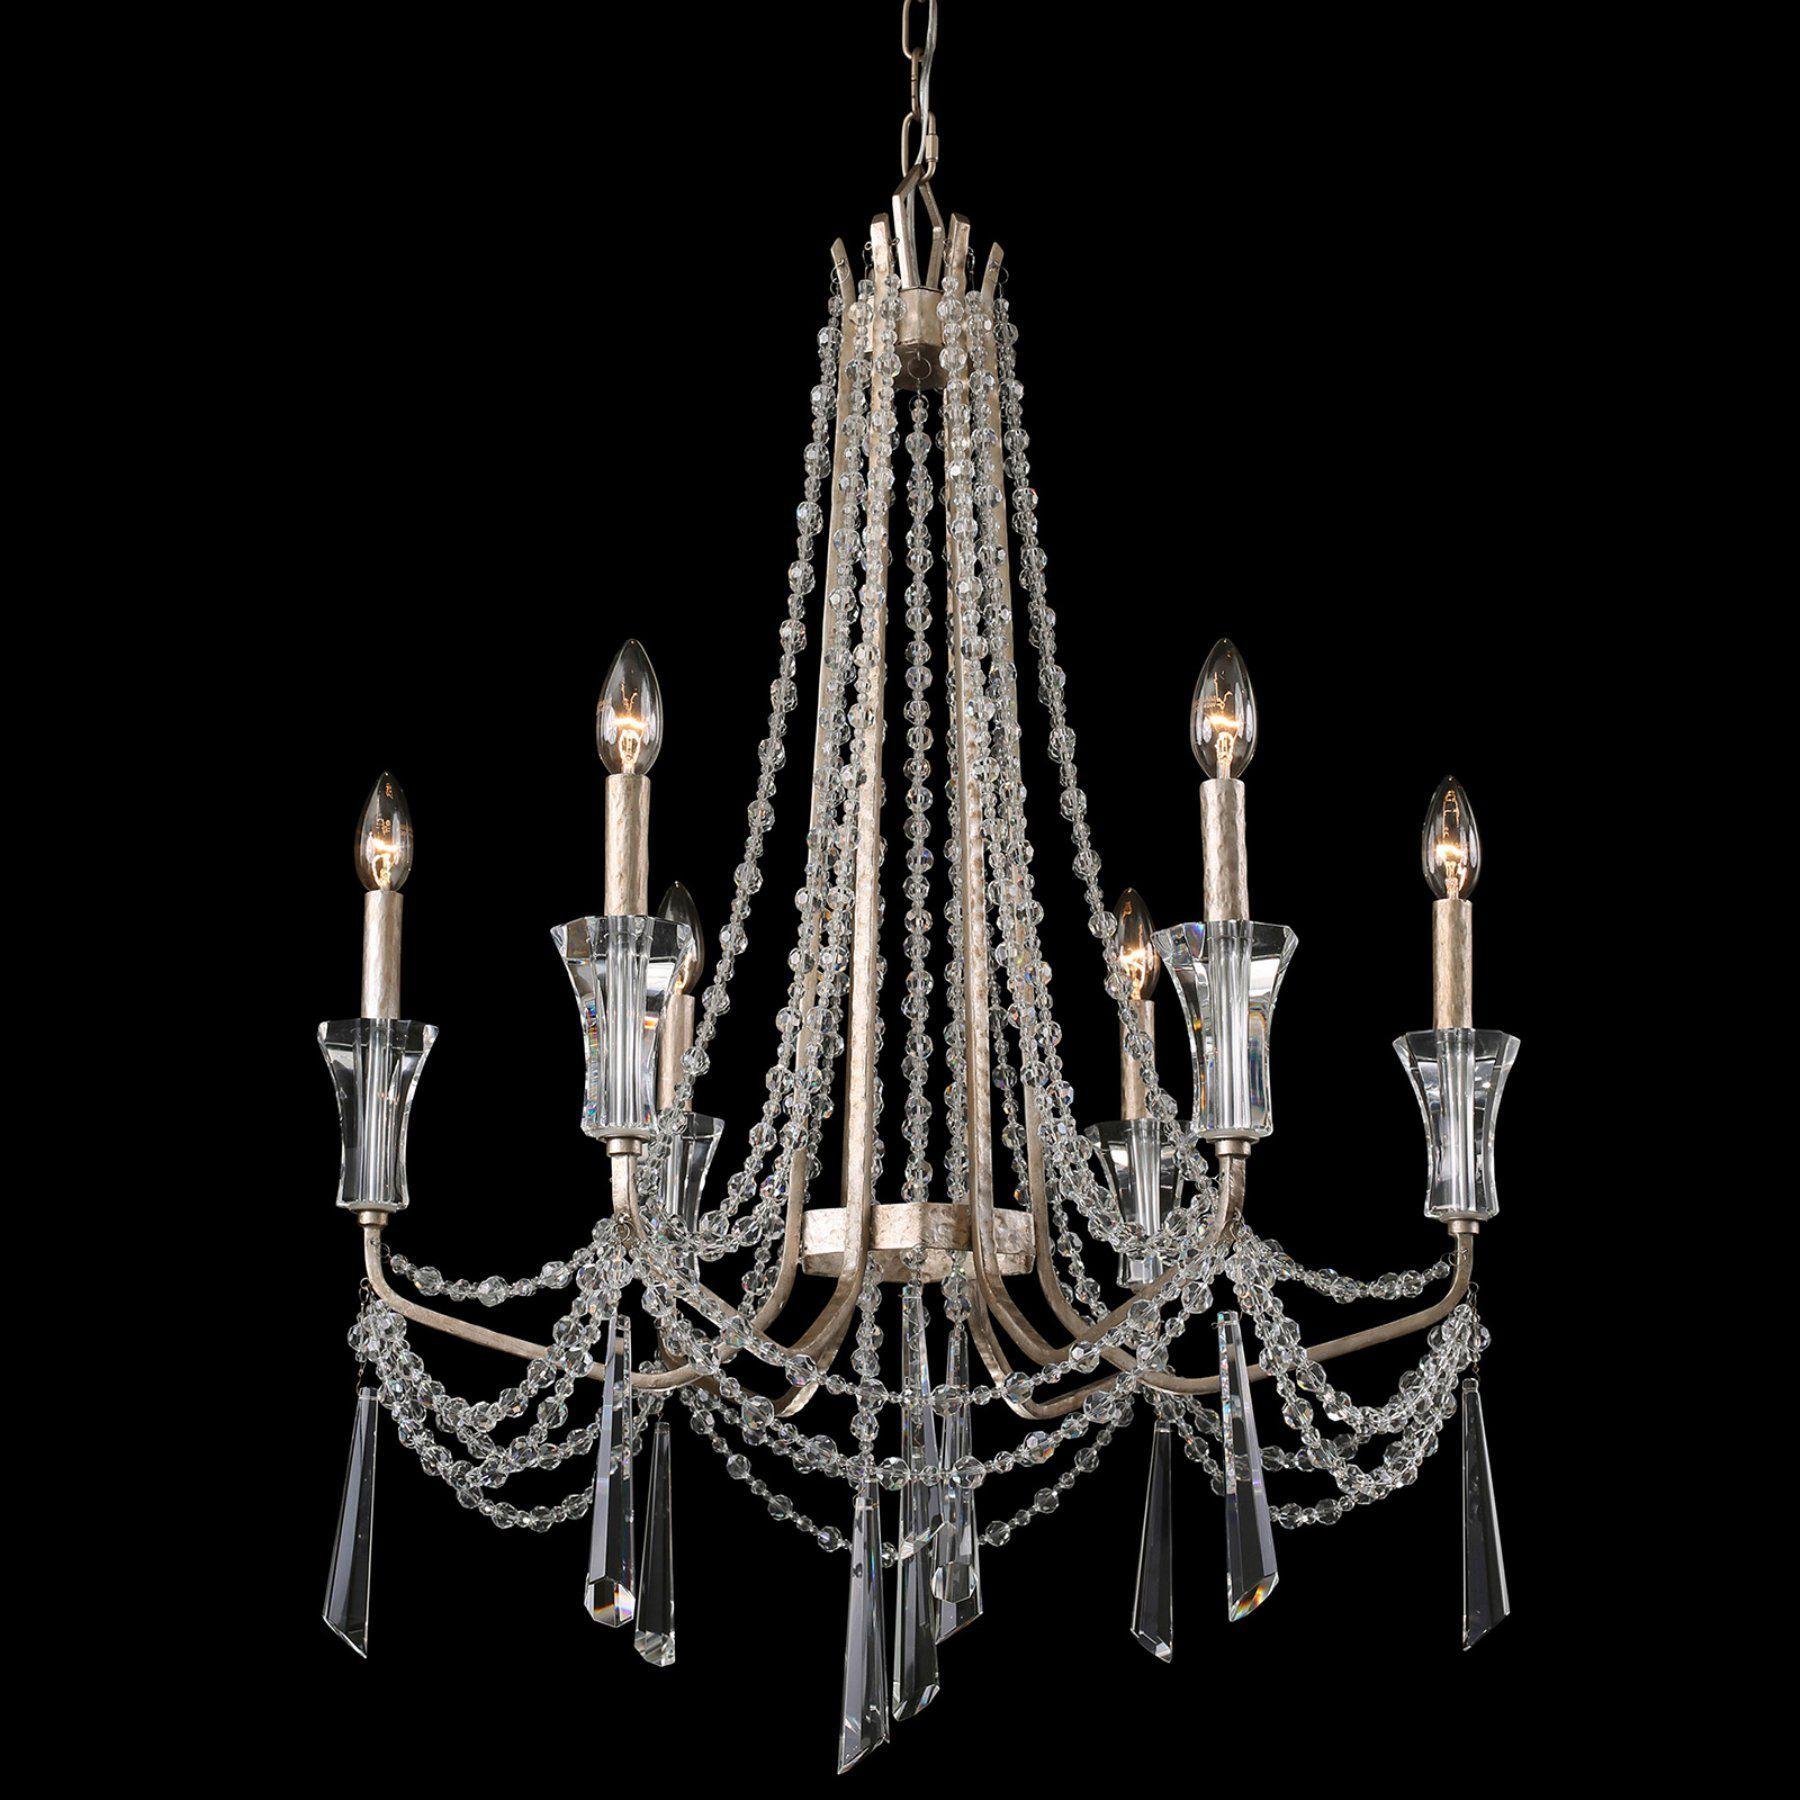 Varaluz barcelona c crystal chandelier ctr products